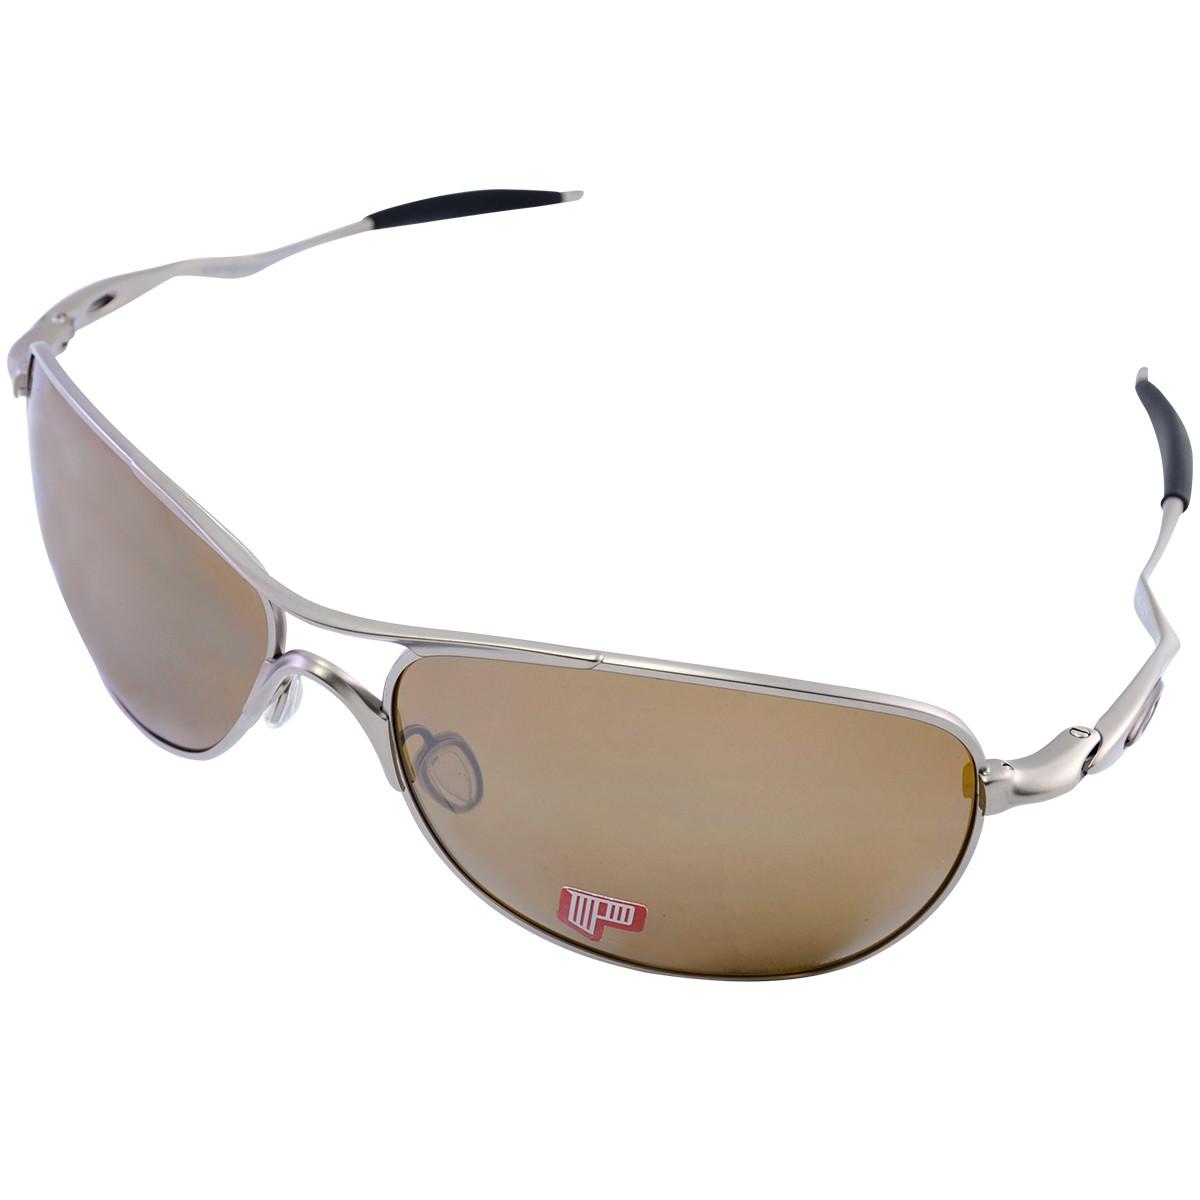 Óculos Oakley Crosshair Brown Titanium Lente Tungstein Iridium Polarizado 3d57300c94